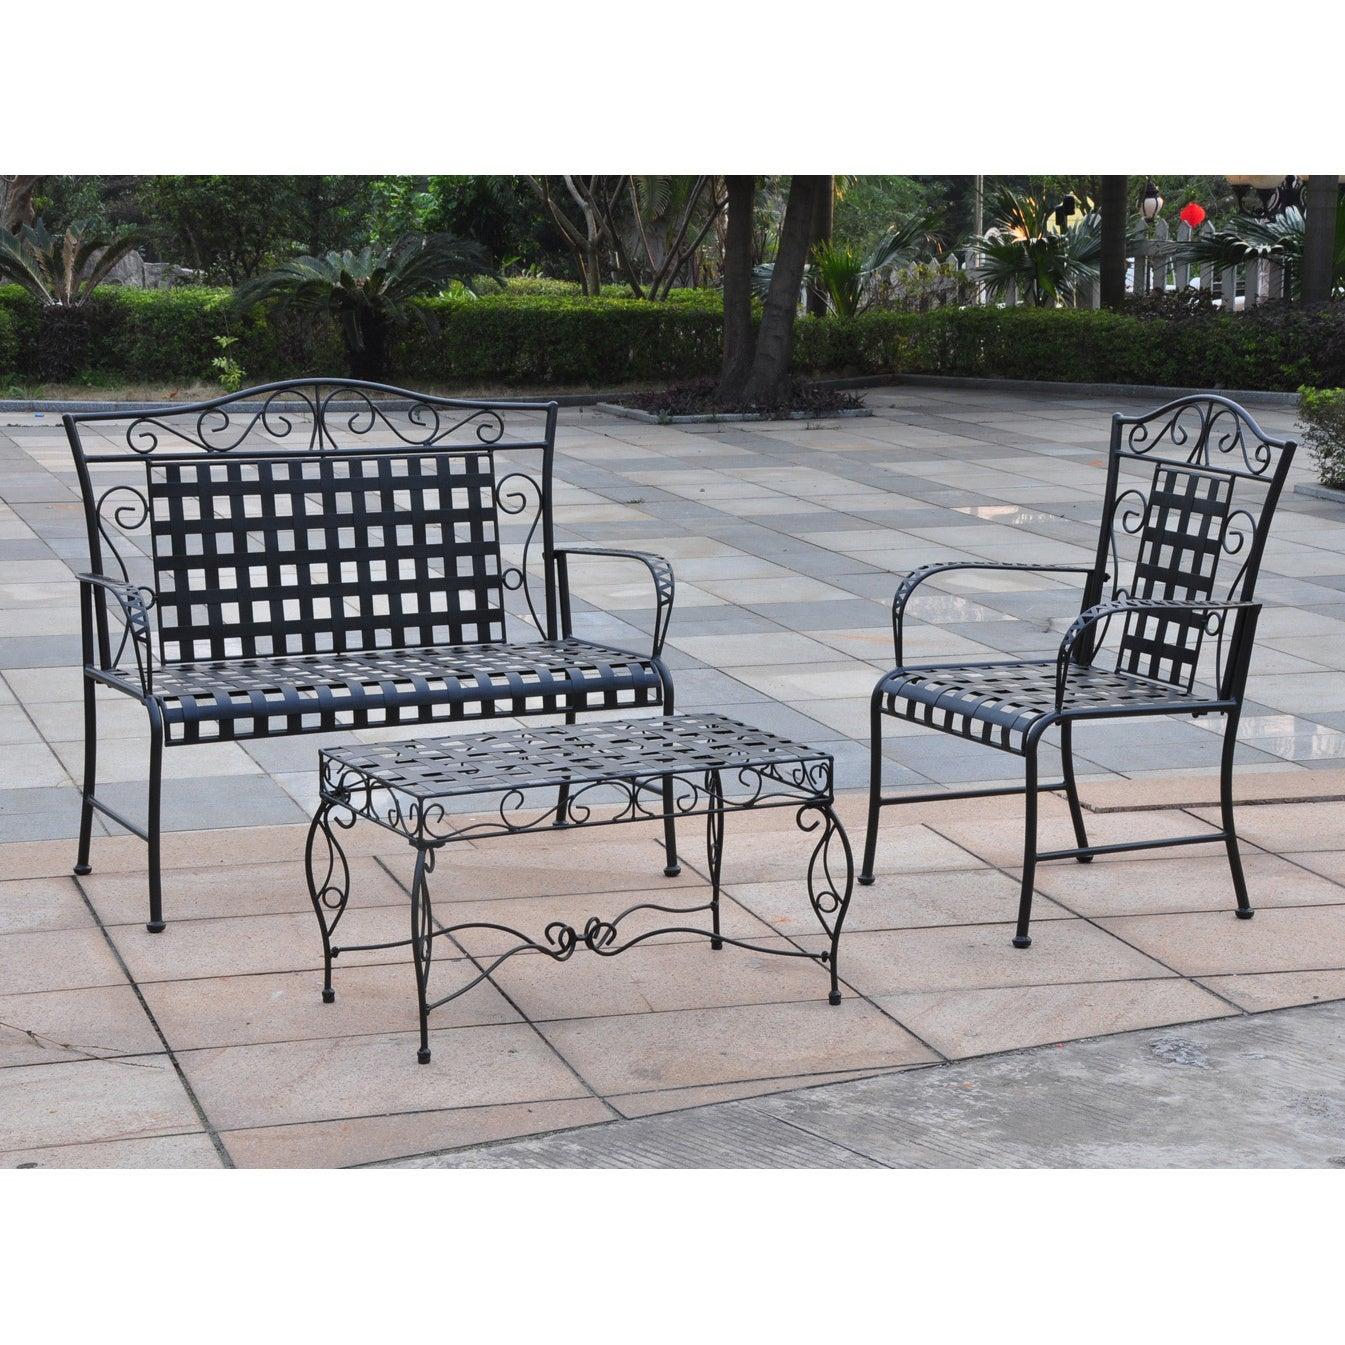 Shop international caravan mandalay 3 piece iron patio conversation set on sale free shipping today overstock 1559461